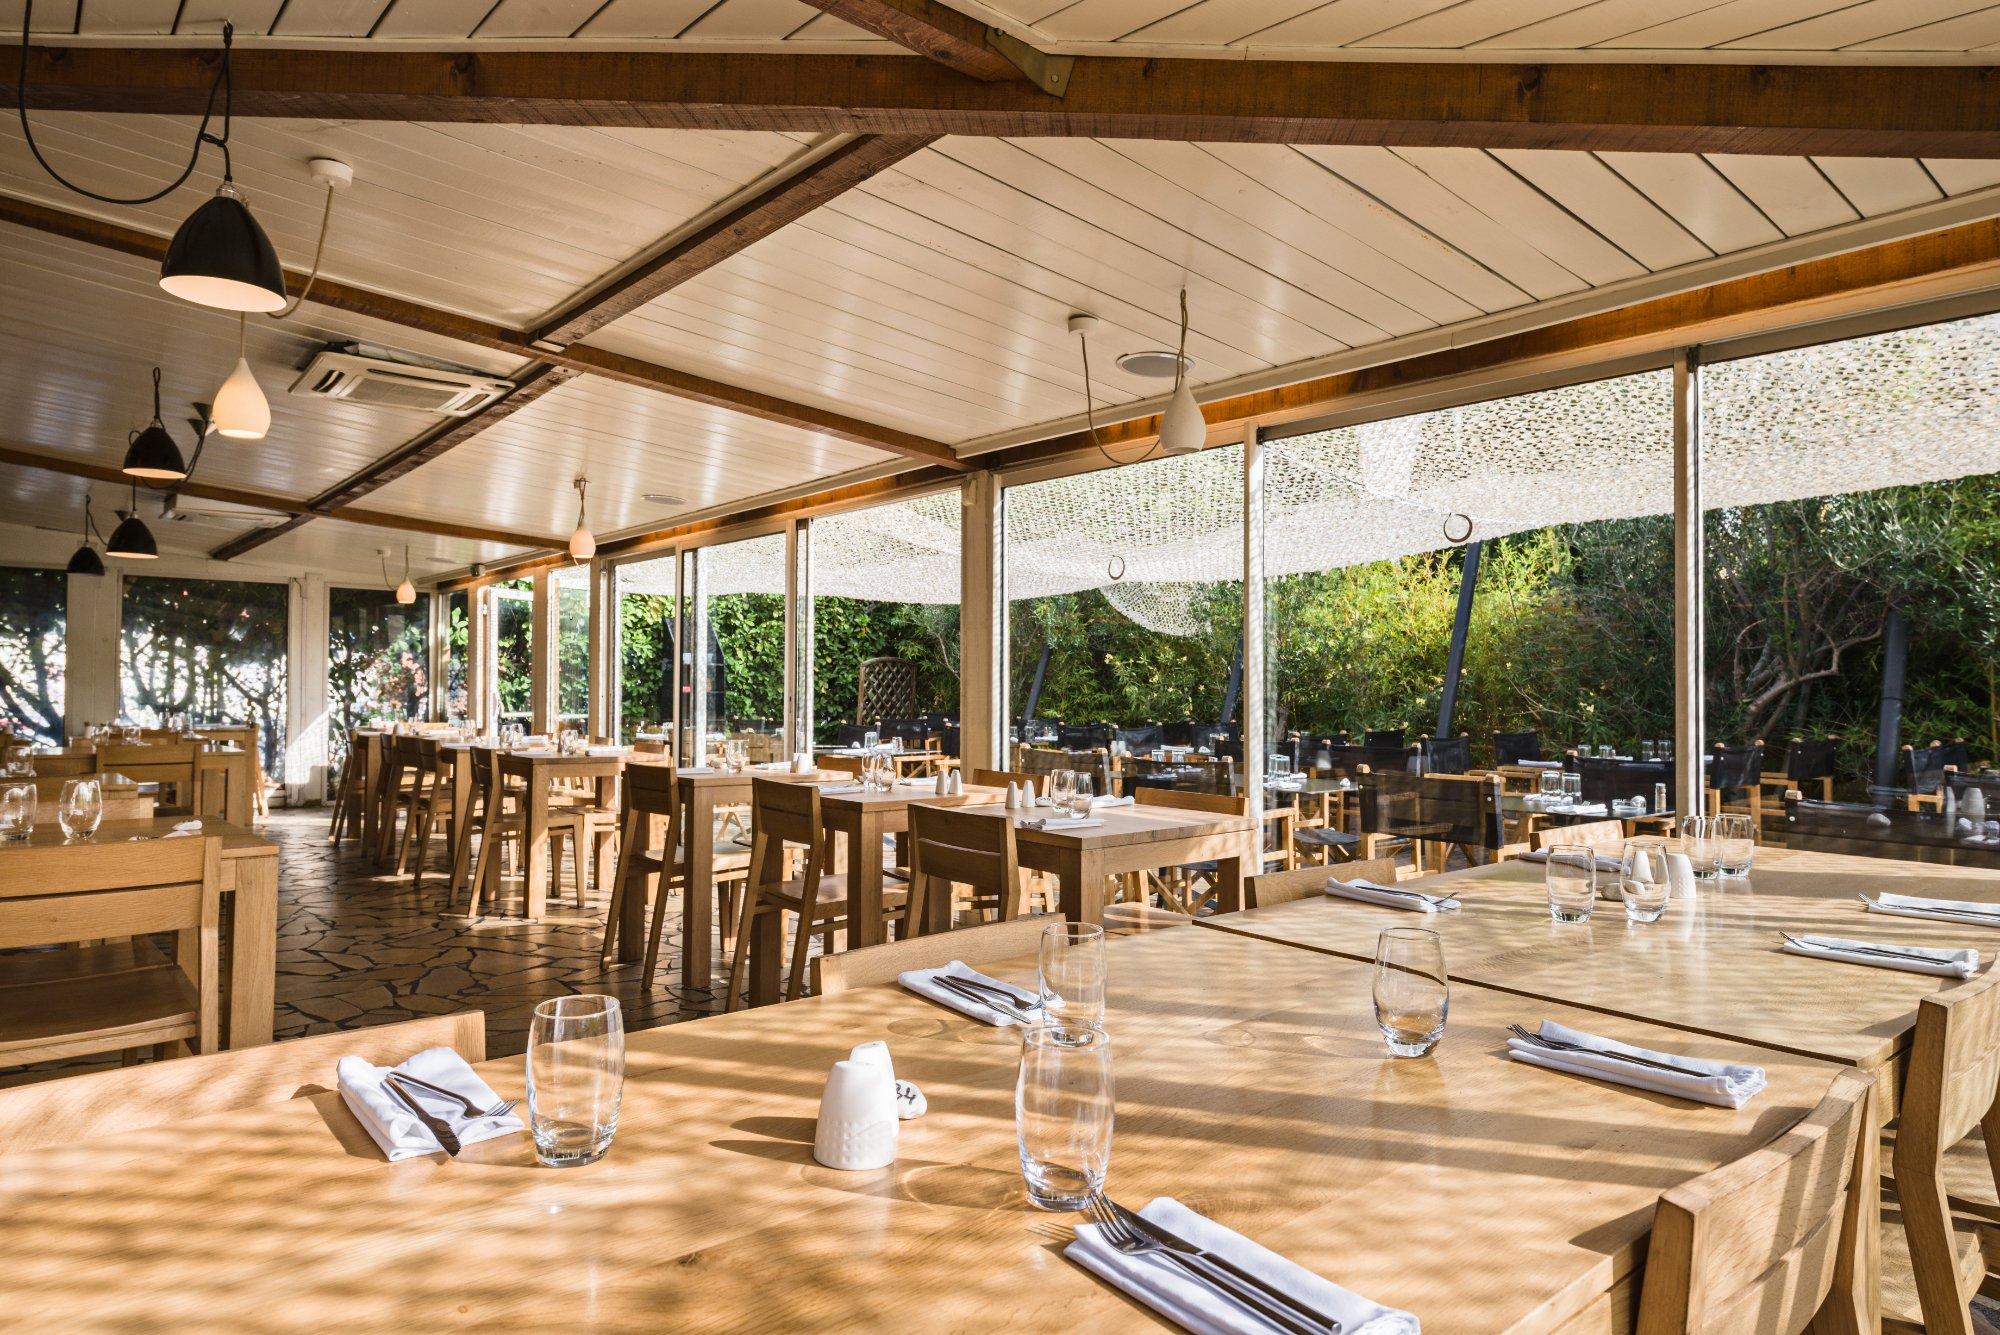 Bio Co La Table Aix En Provence Restaurant Reviews Phone Number Photos Tripadvisor